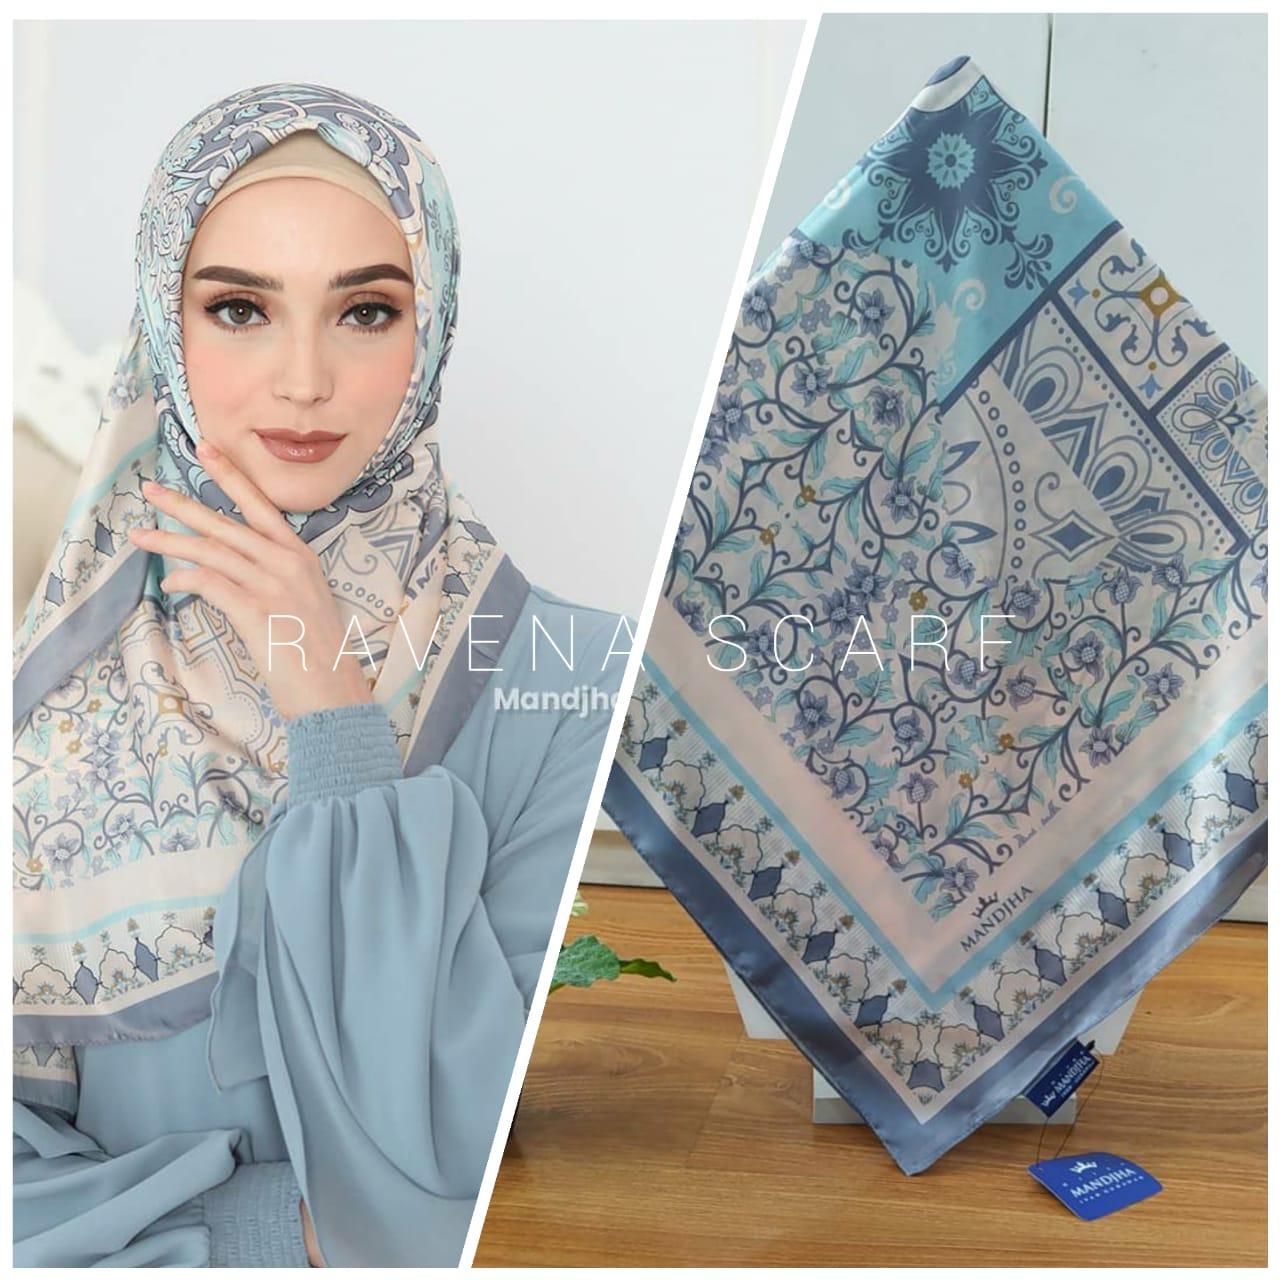 Jual Produk Mandjha Hijab By Ivan Gunawan Terbaru Lazada Co Id